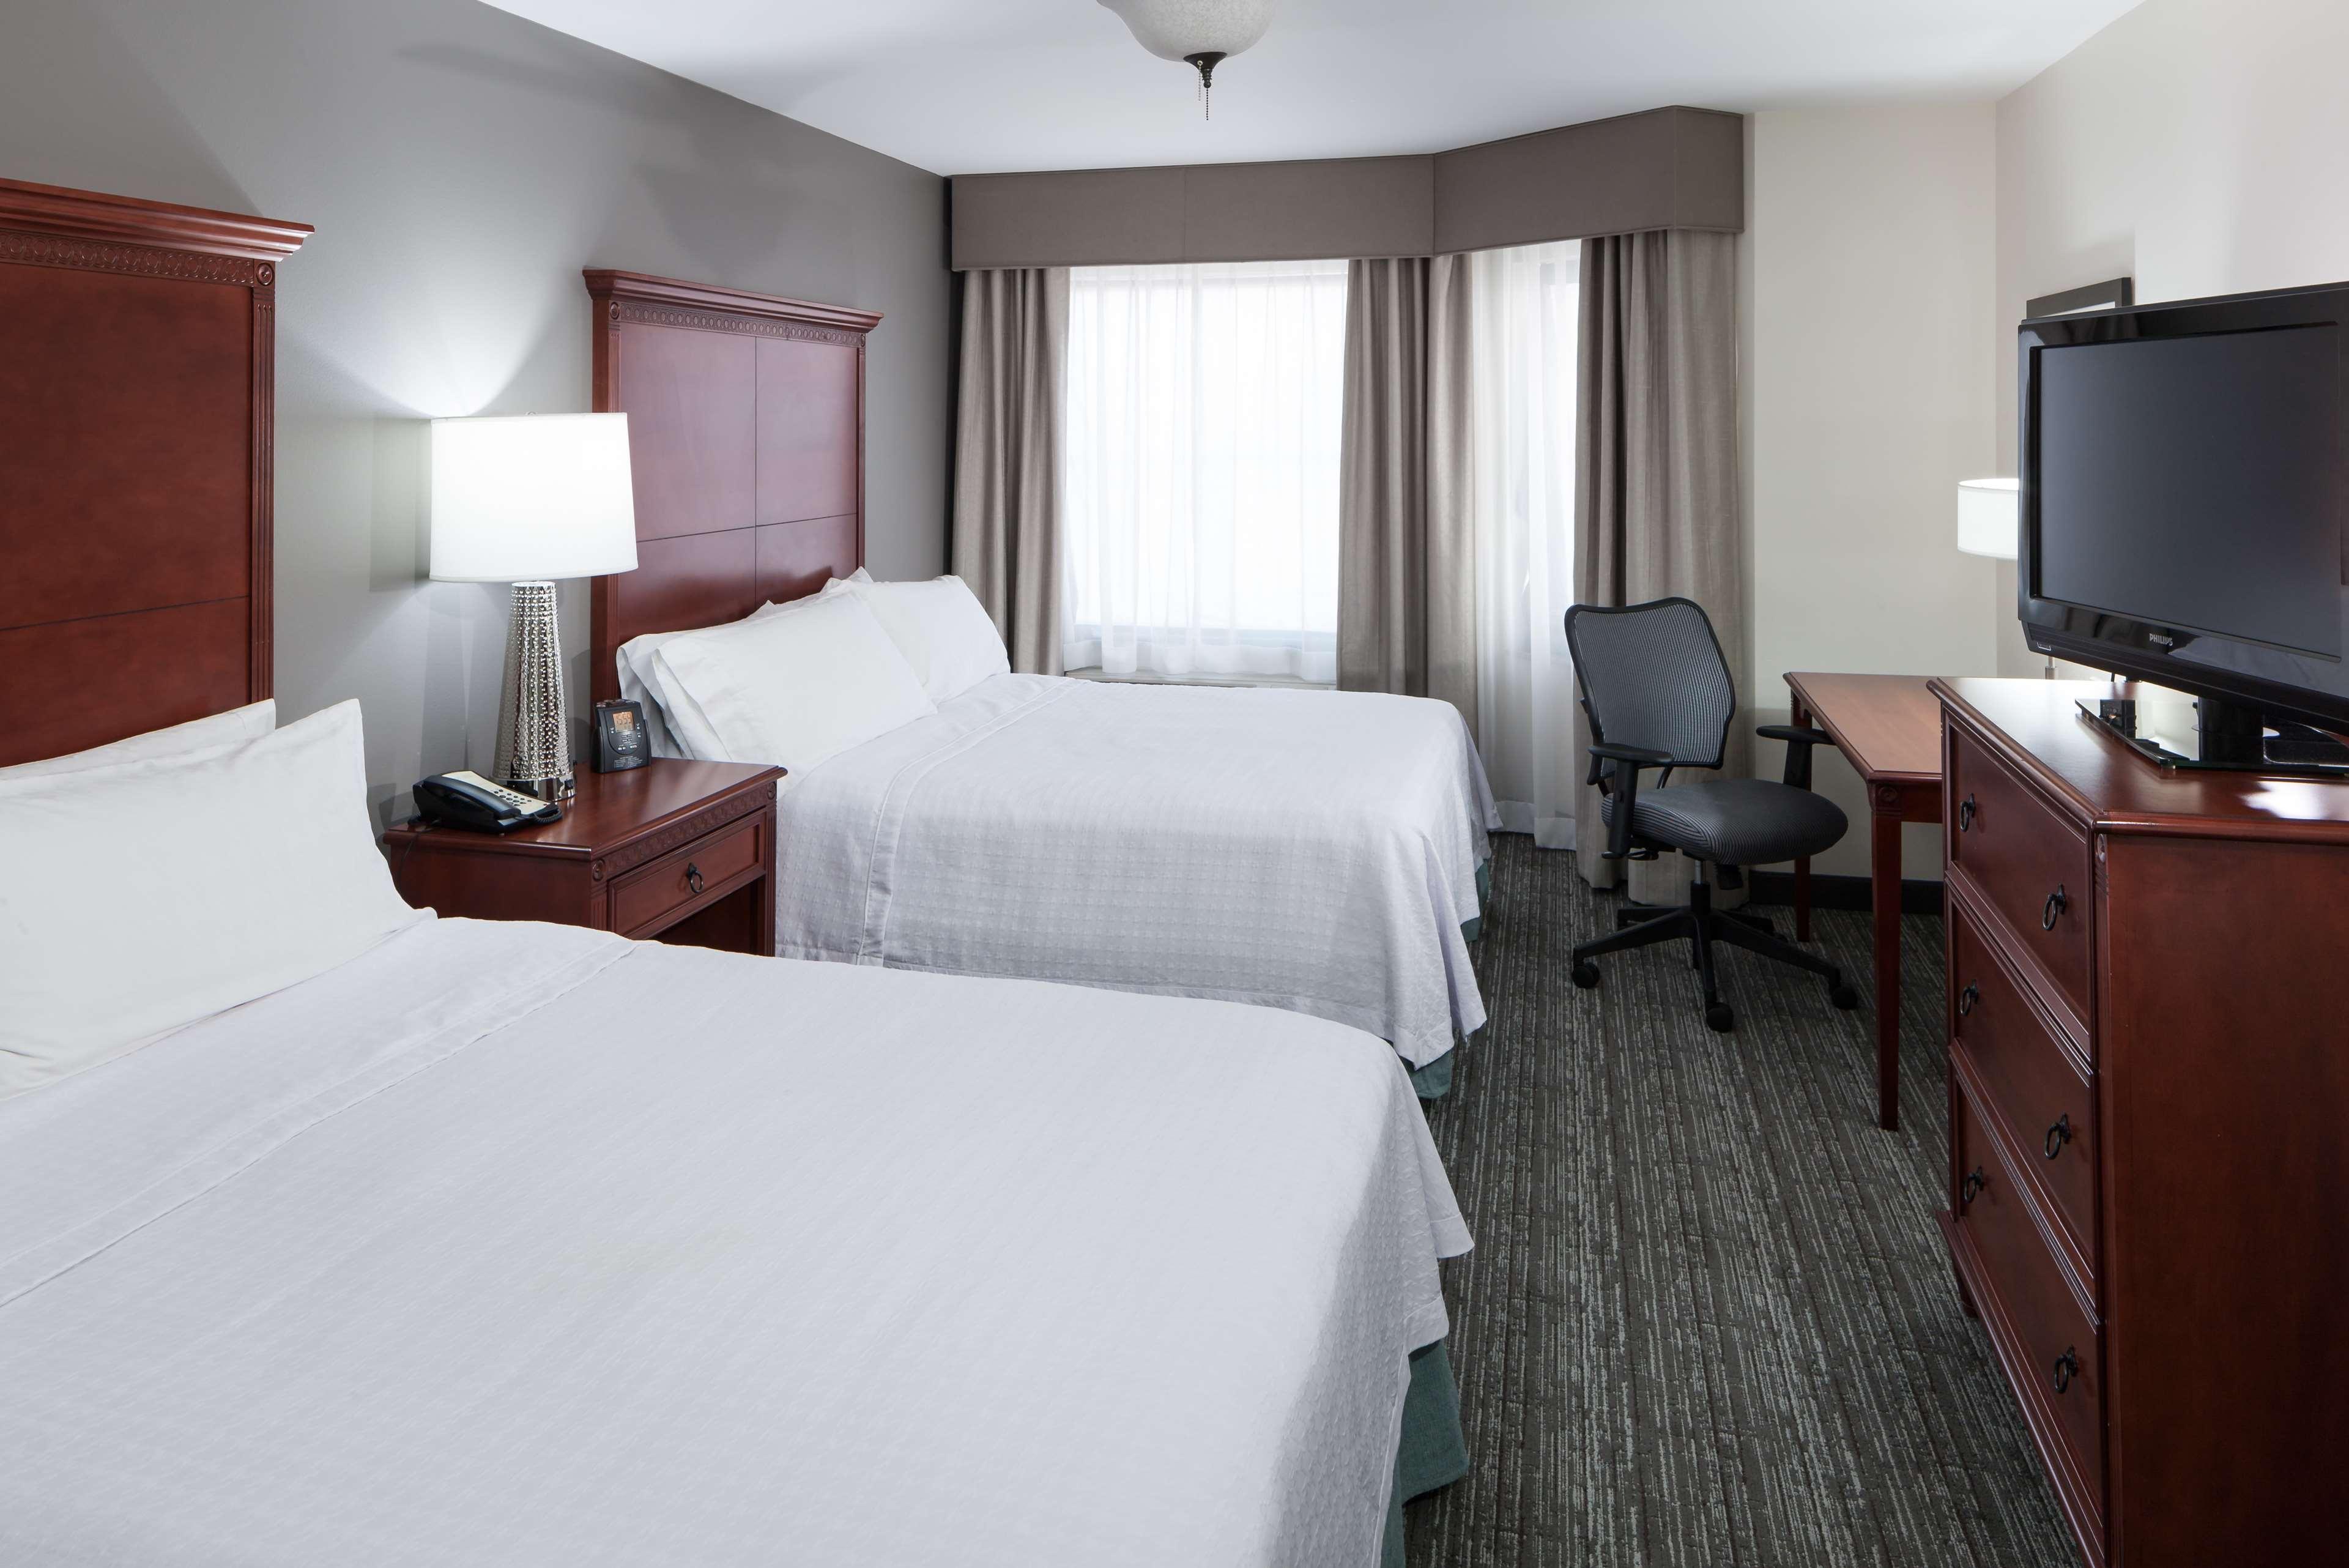 Homewood Suites by Hilton Denton image 24